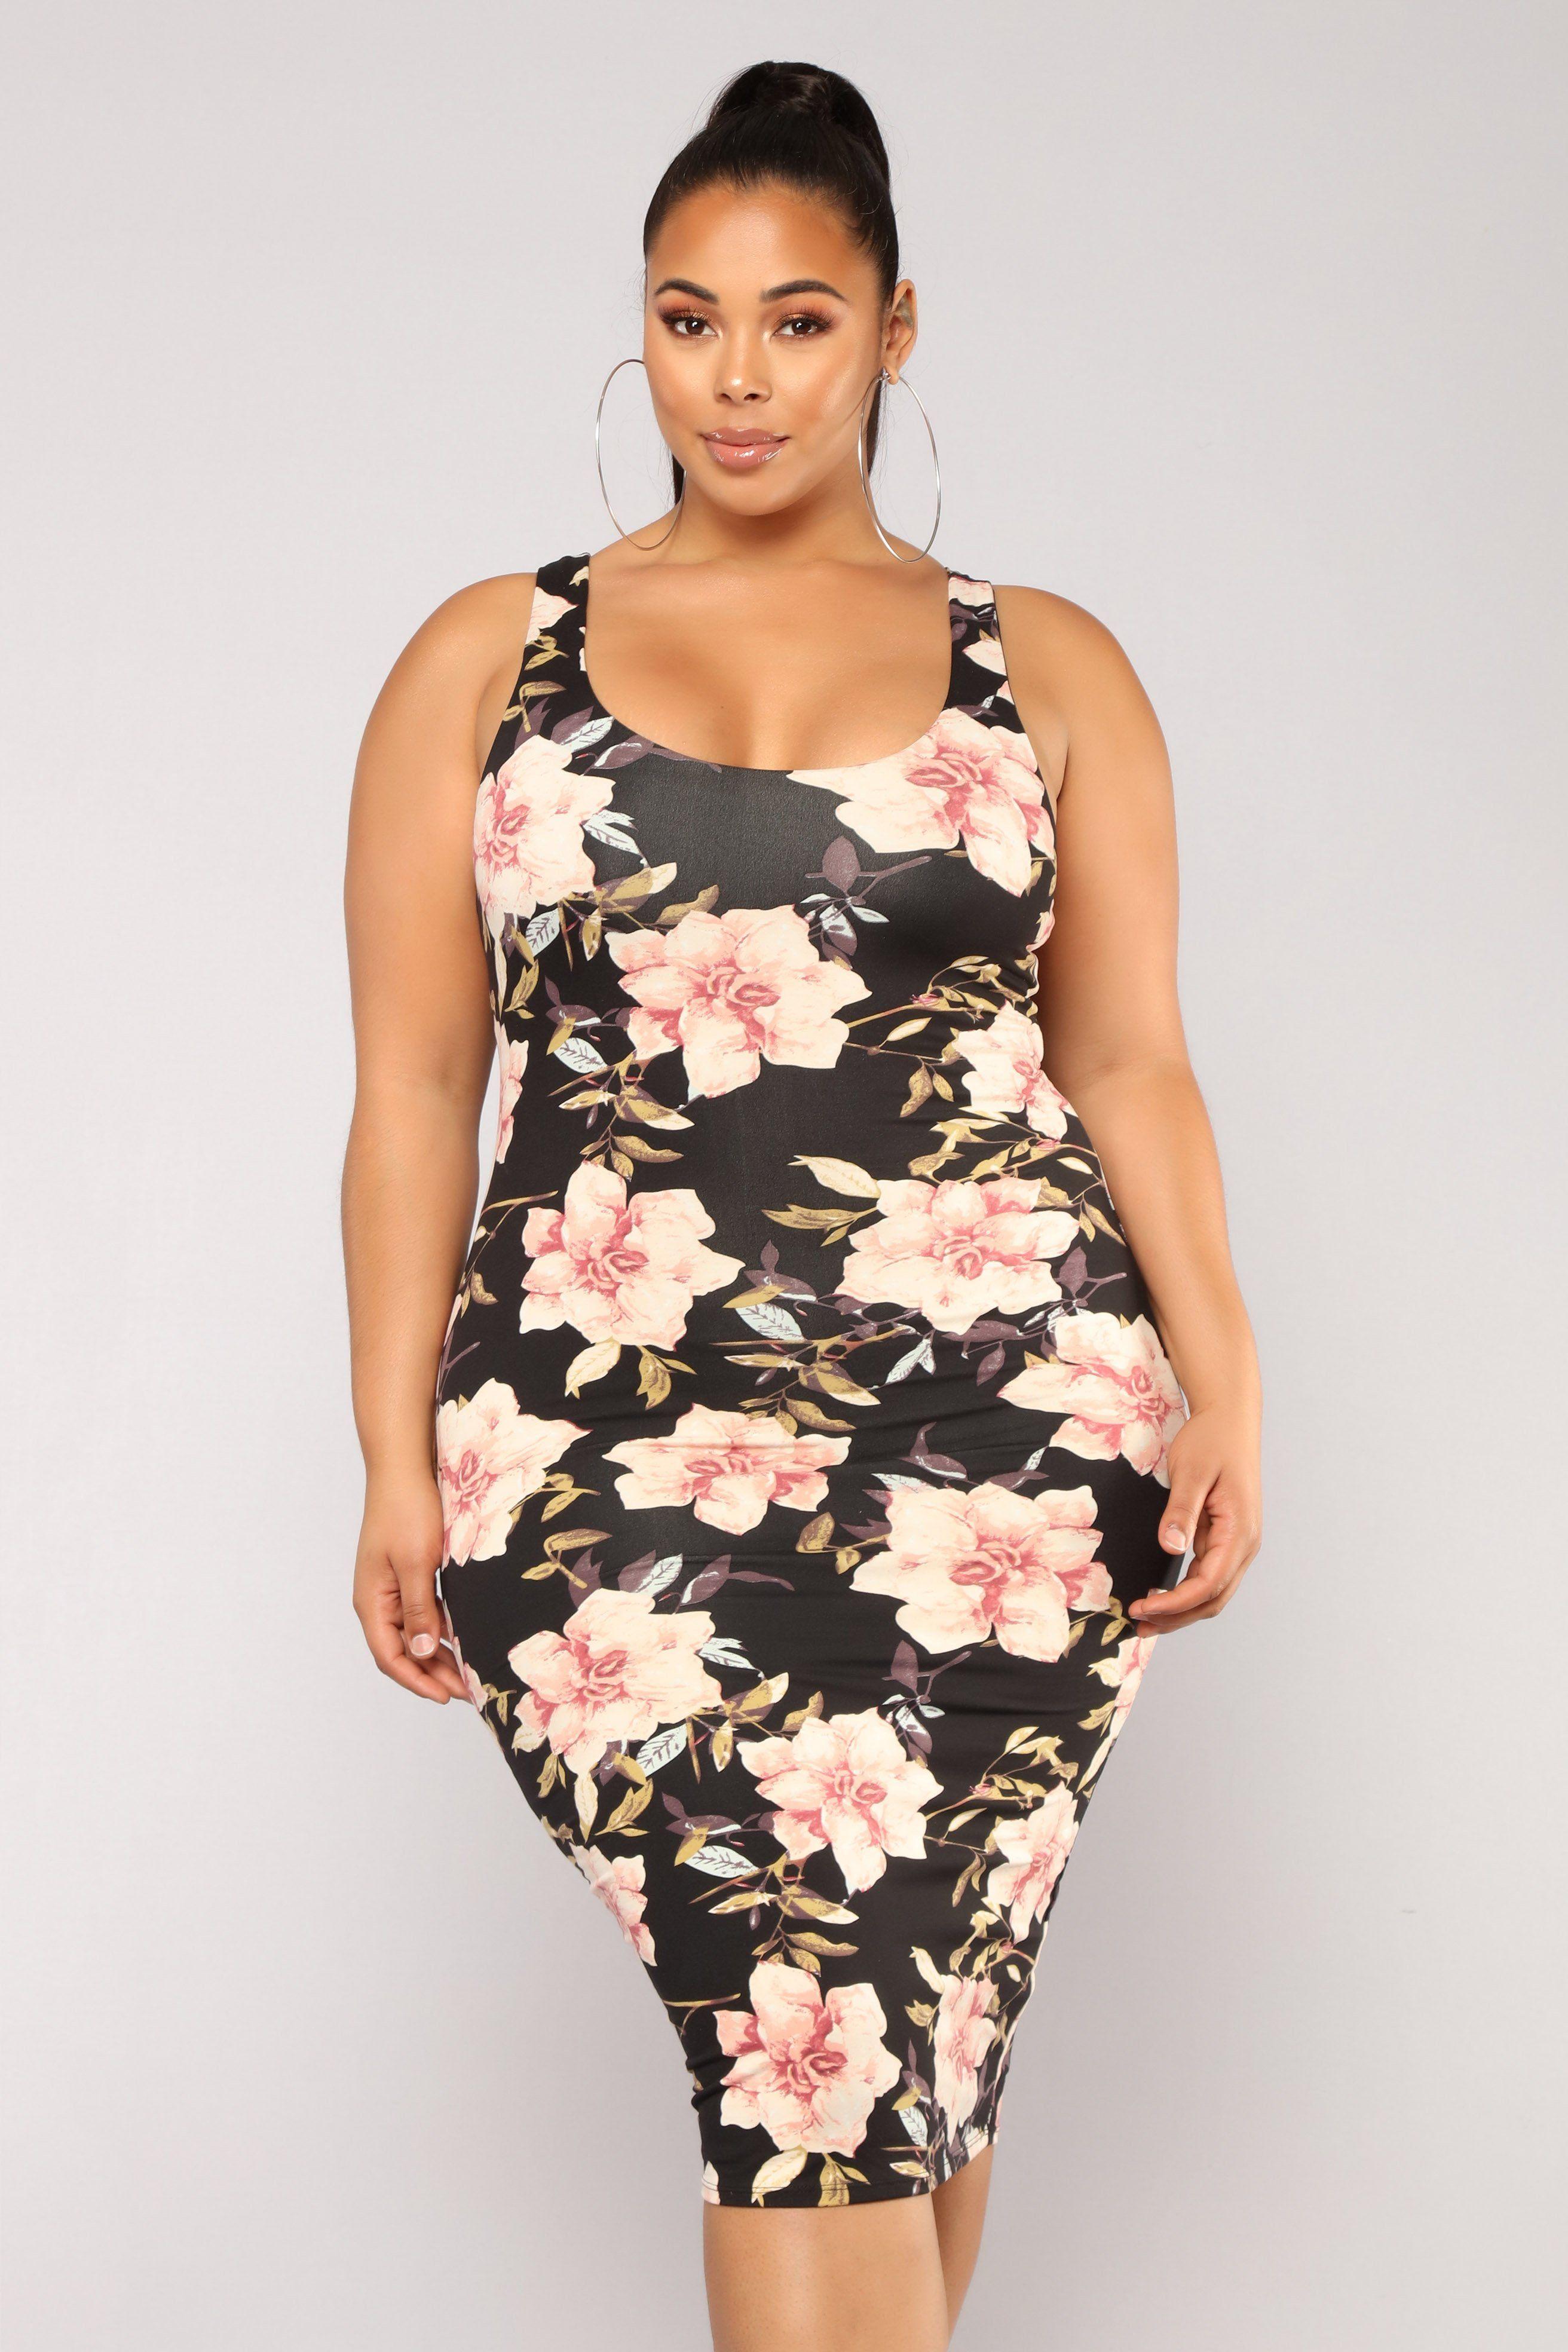 Need More Flowers Dress Black Plus Size Black Dresses Plus Size Outfits Fashion